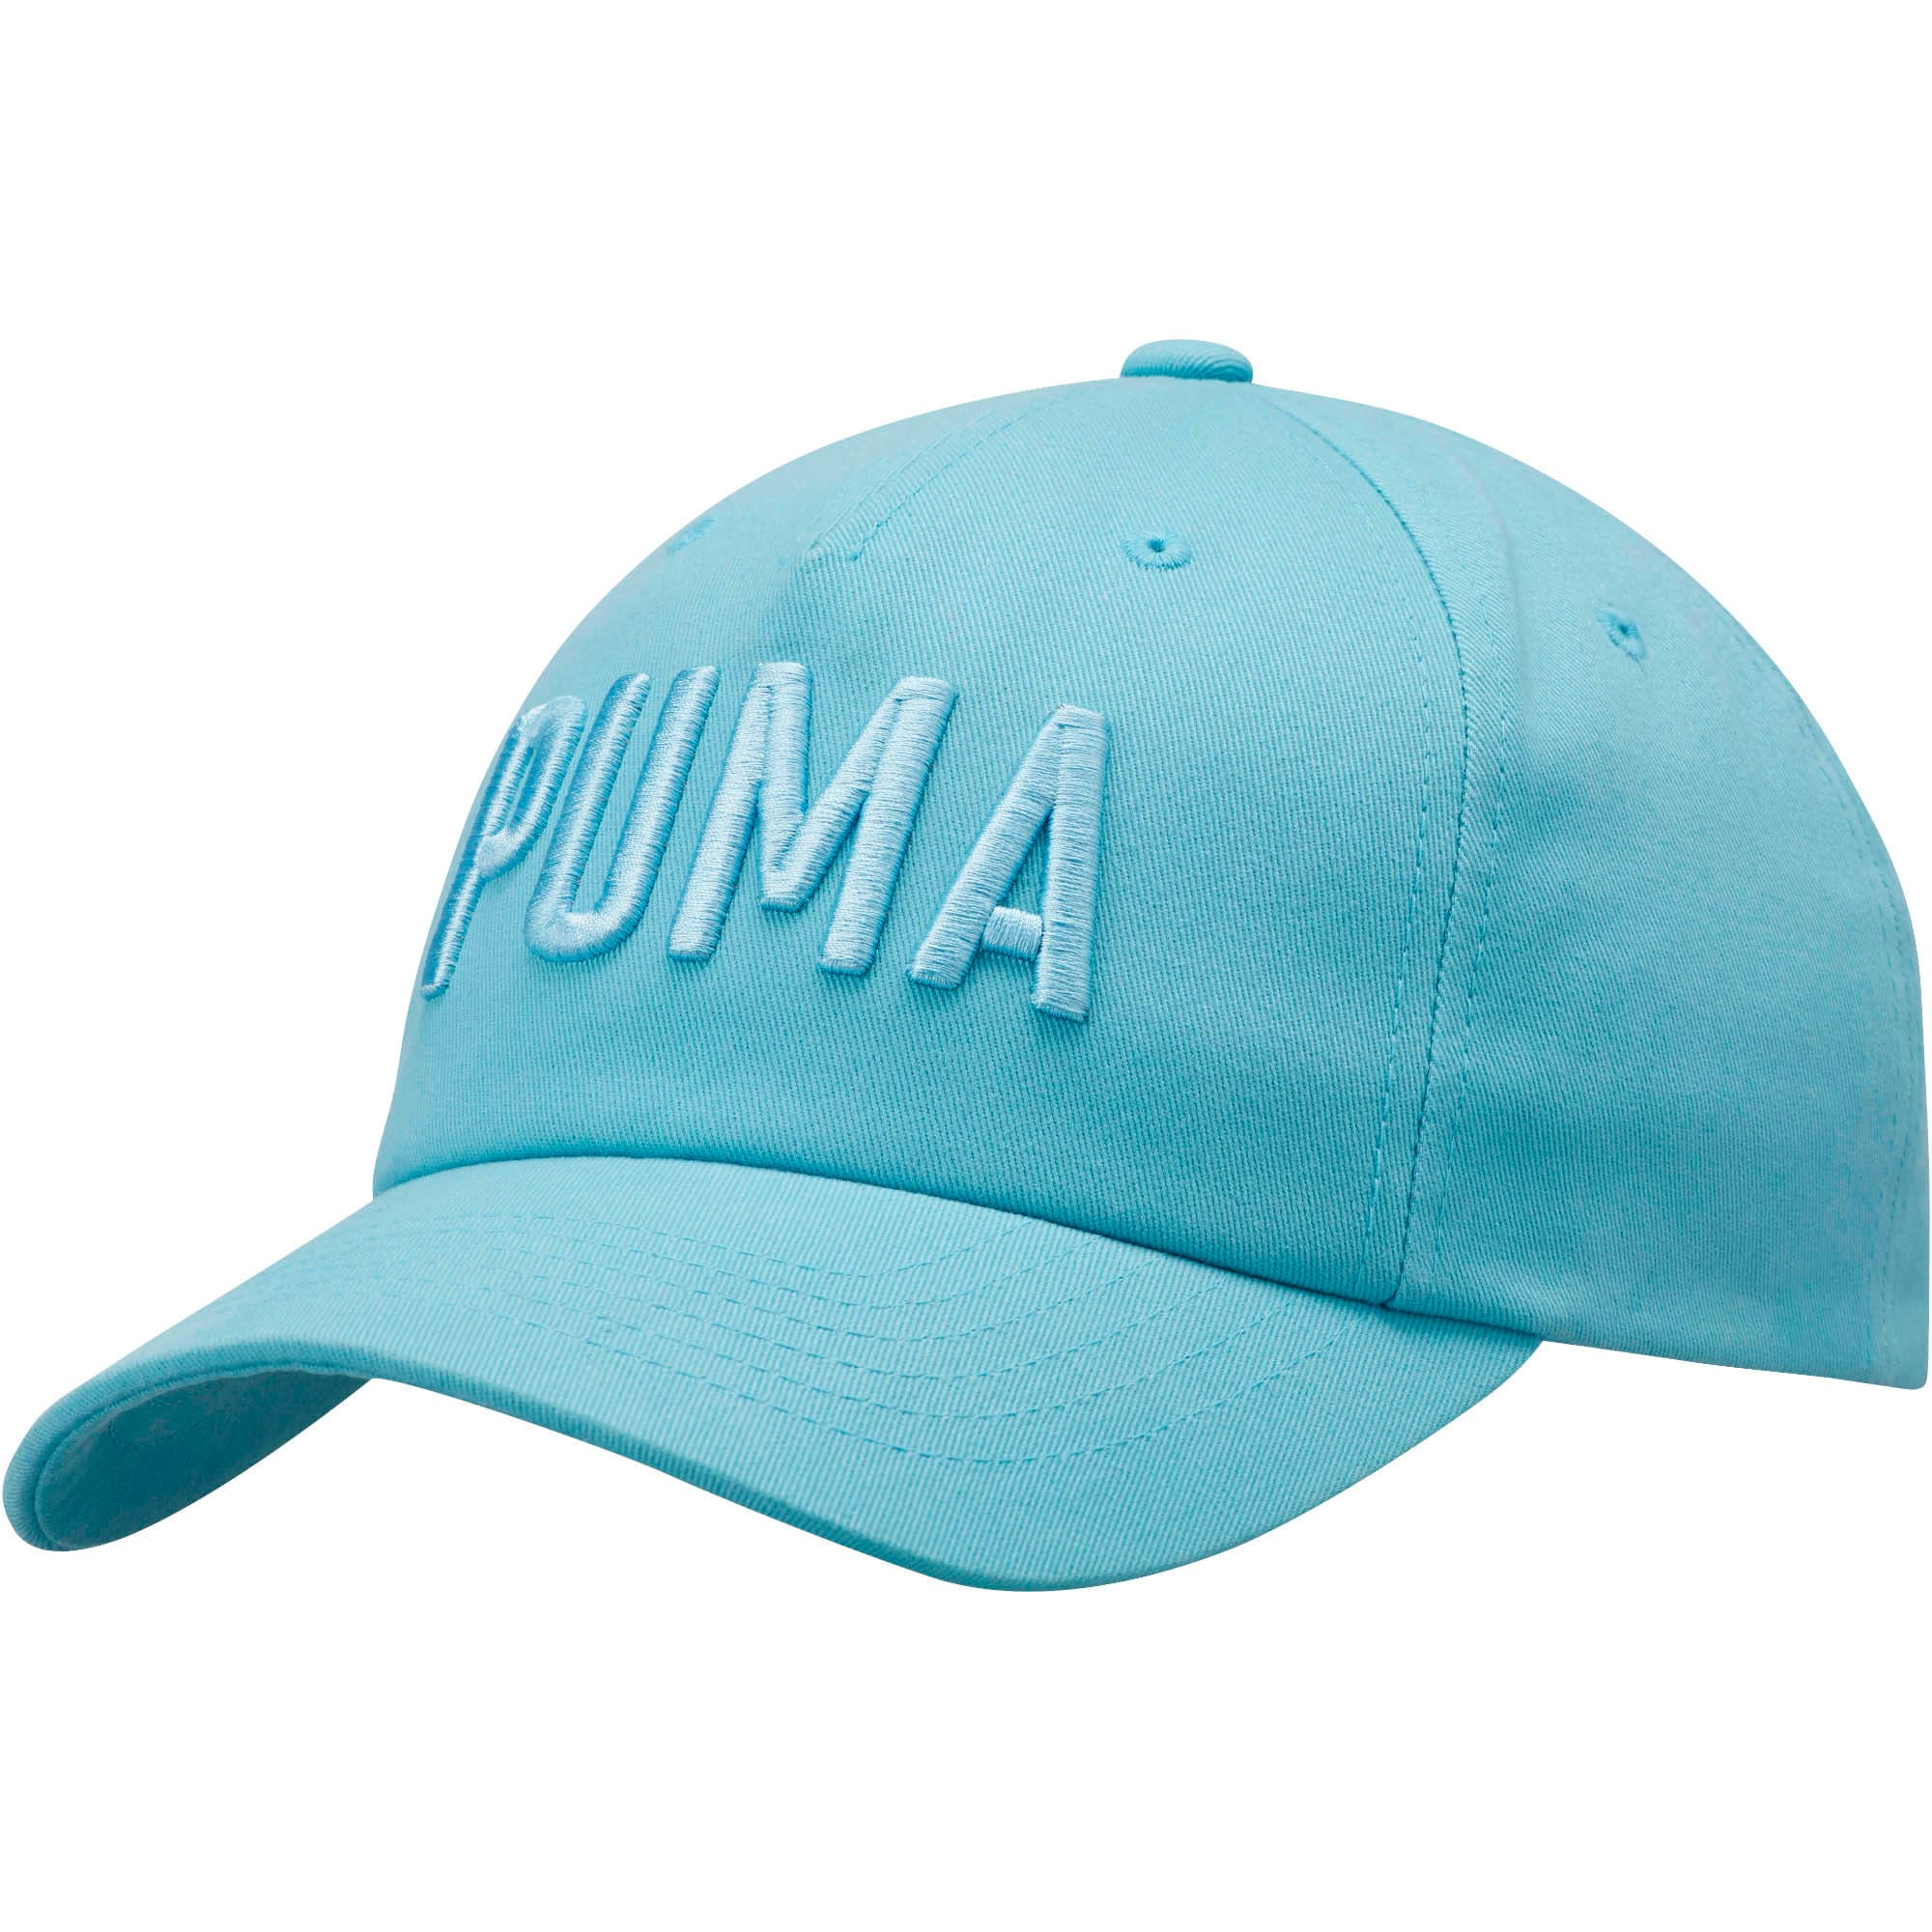 Thumbnail 1 of PUMA Classic Dad Cap, Medium Blue, medium